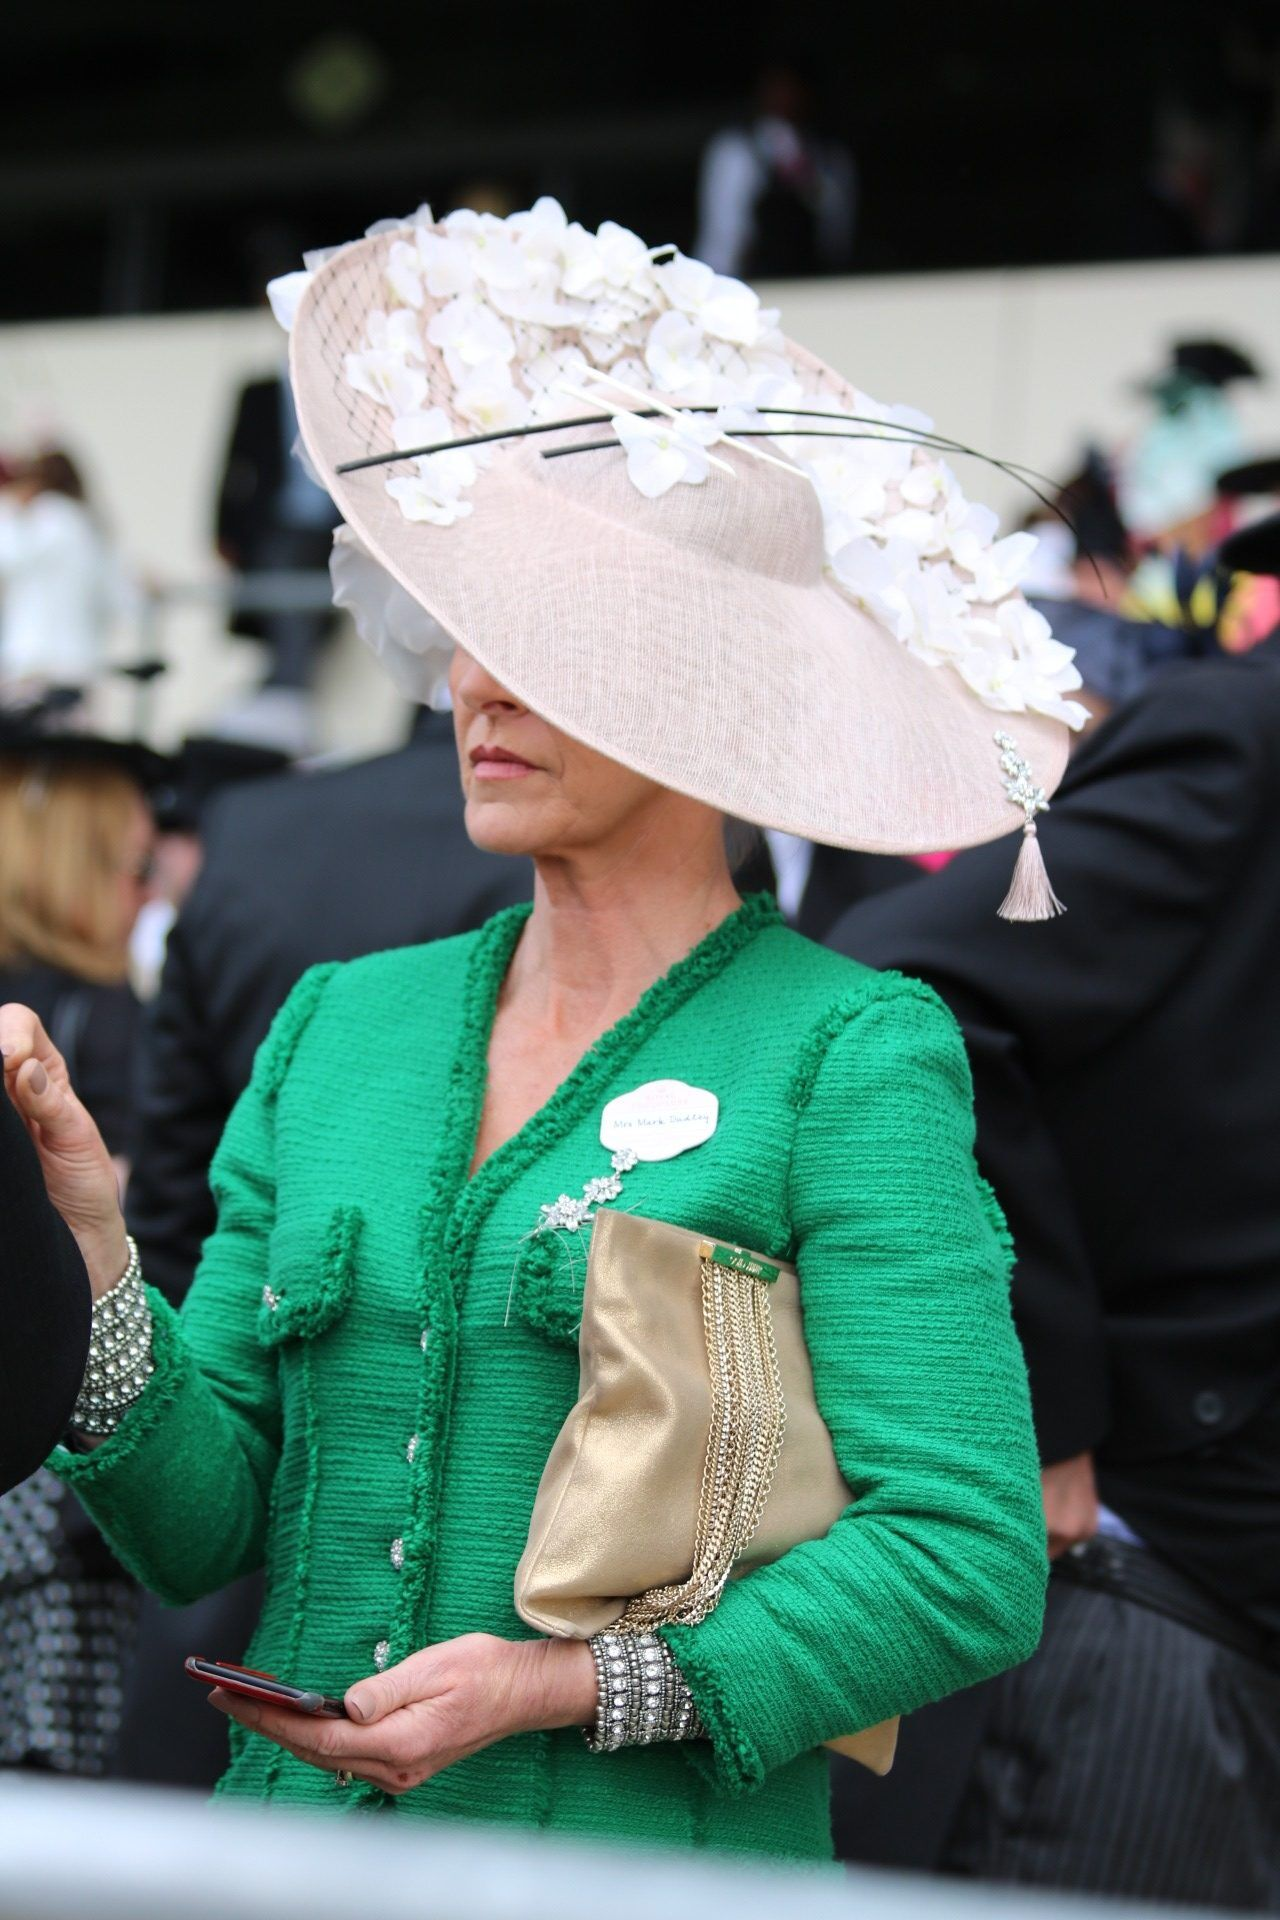 Big Hats and fascinators ladies day